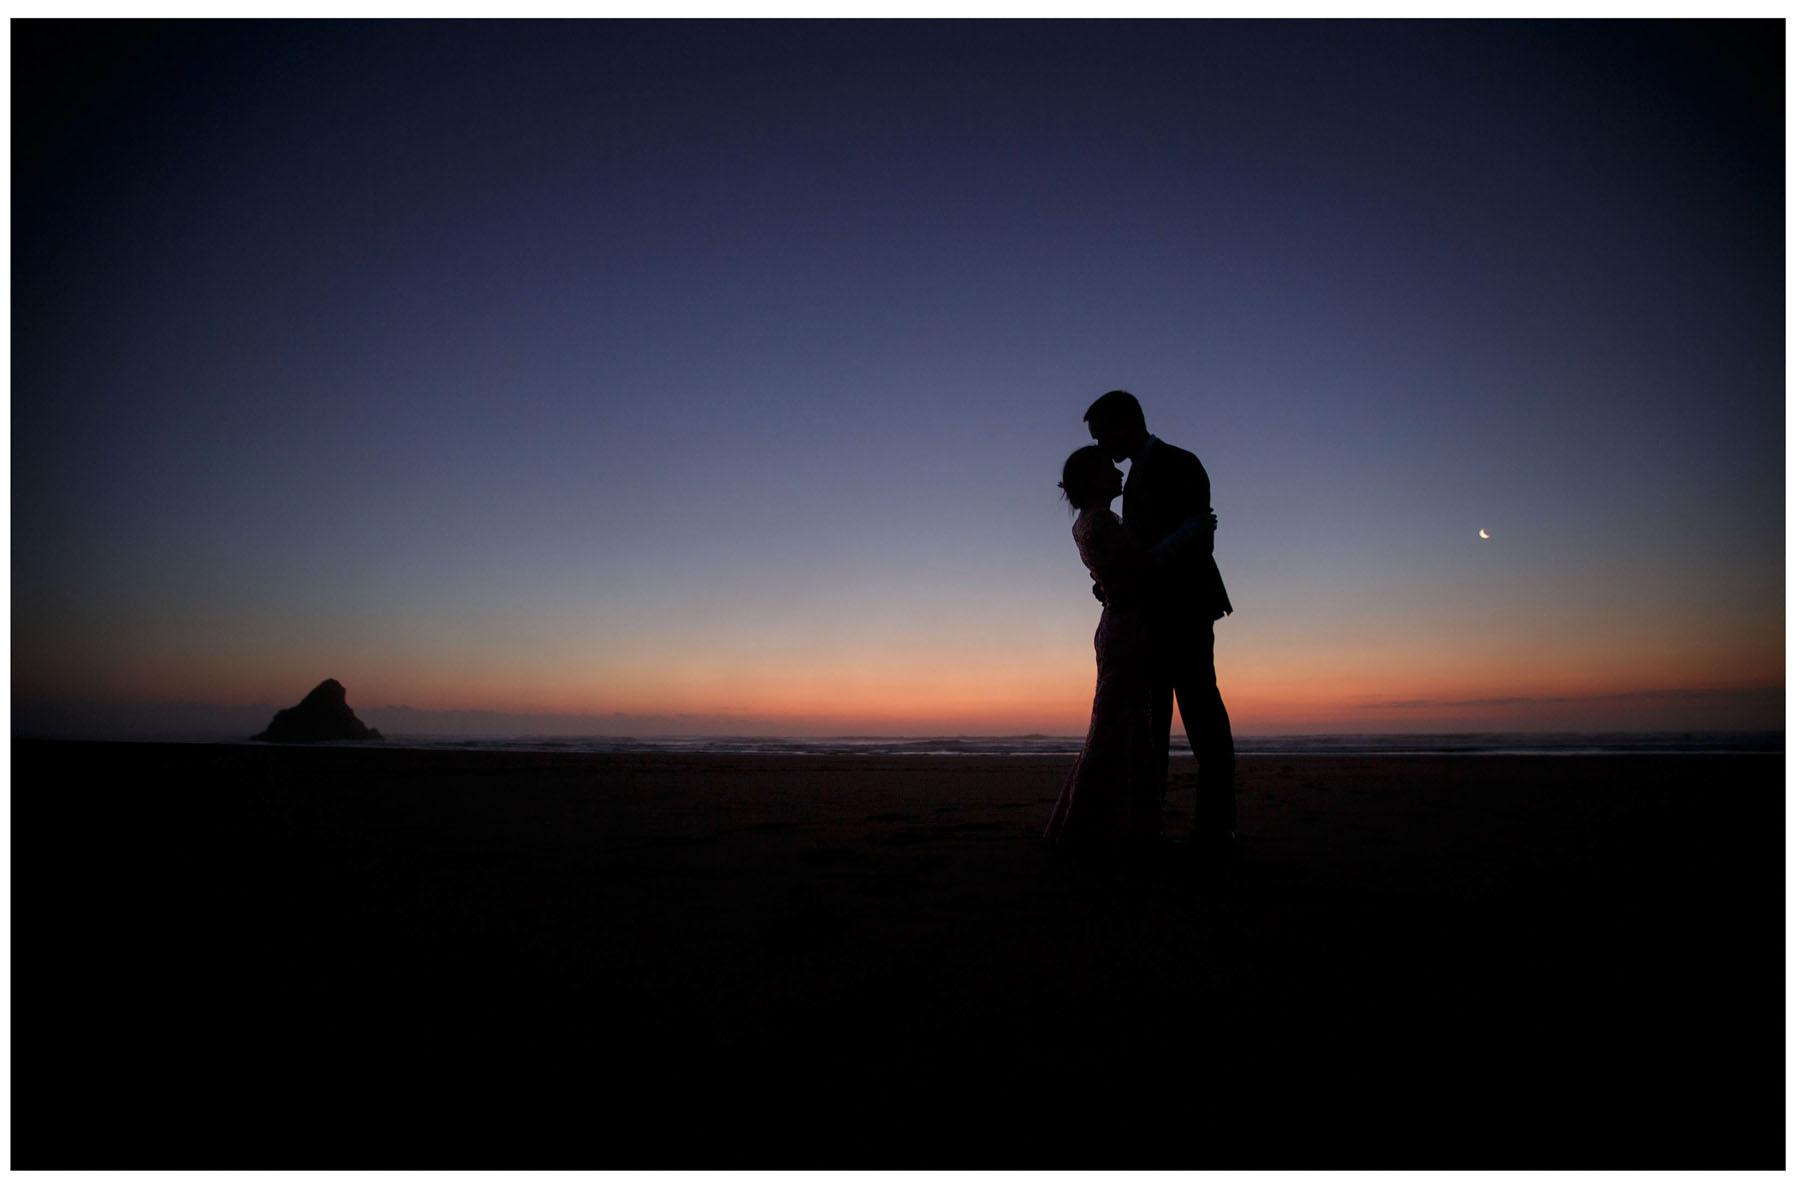 wedding photograph by Auckland wedding photographer Chris Loufte www.theweddingphotographer.co.nz Kitekite waterfall